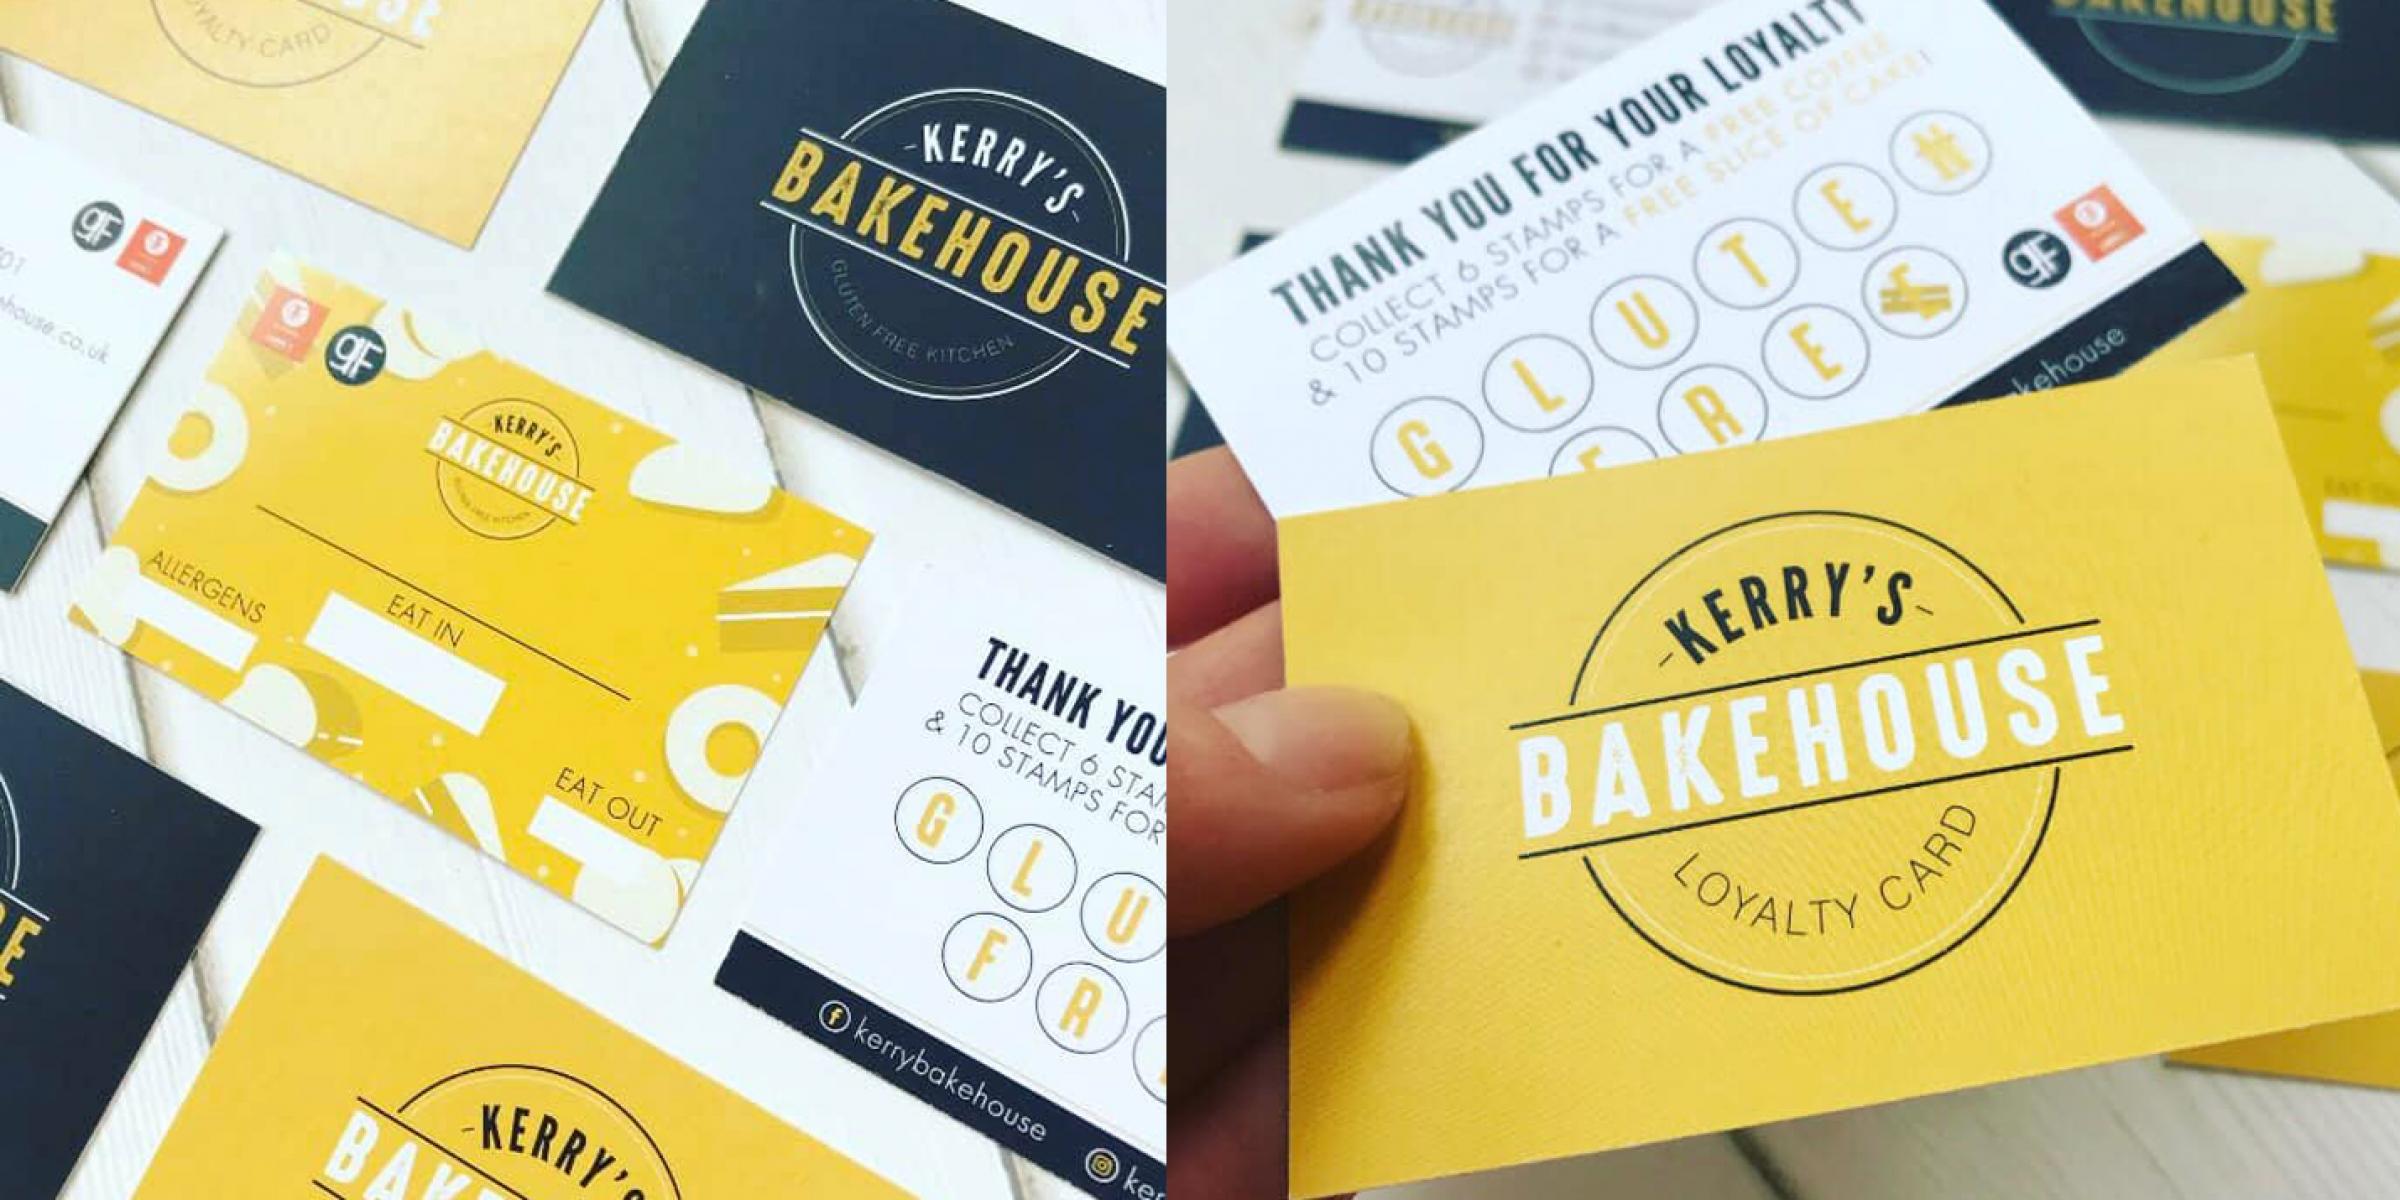 Kerrys Bakehouse Stationery